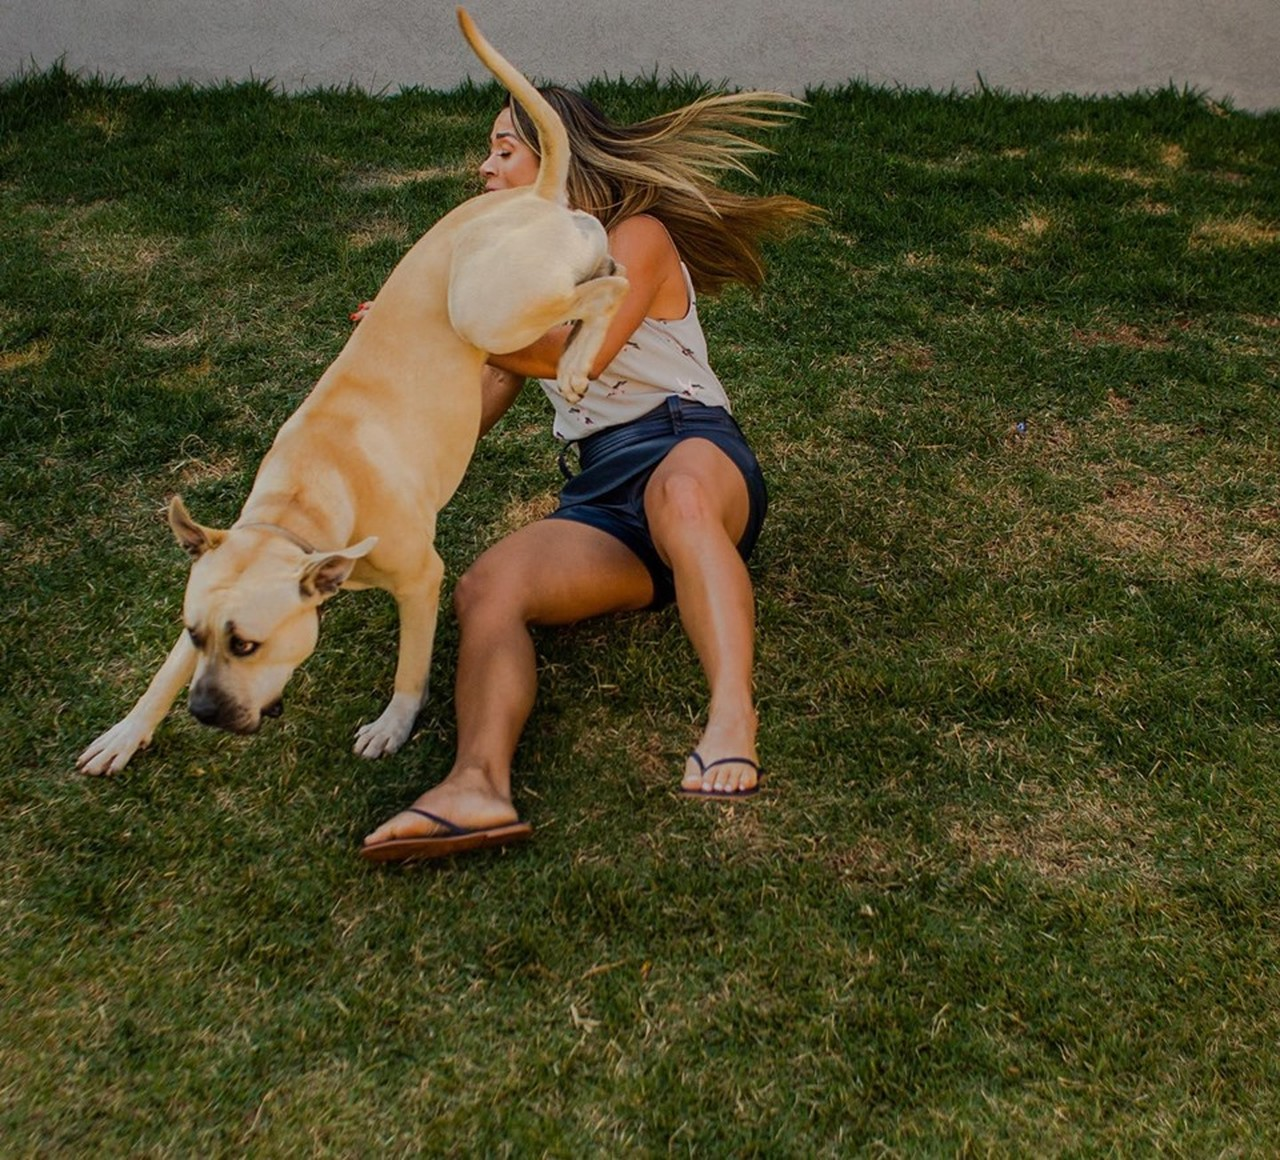 Cachorro rouba cena ensaio noivado conquista internet